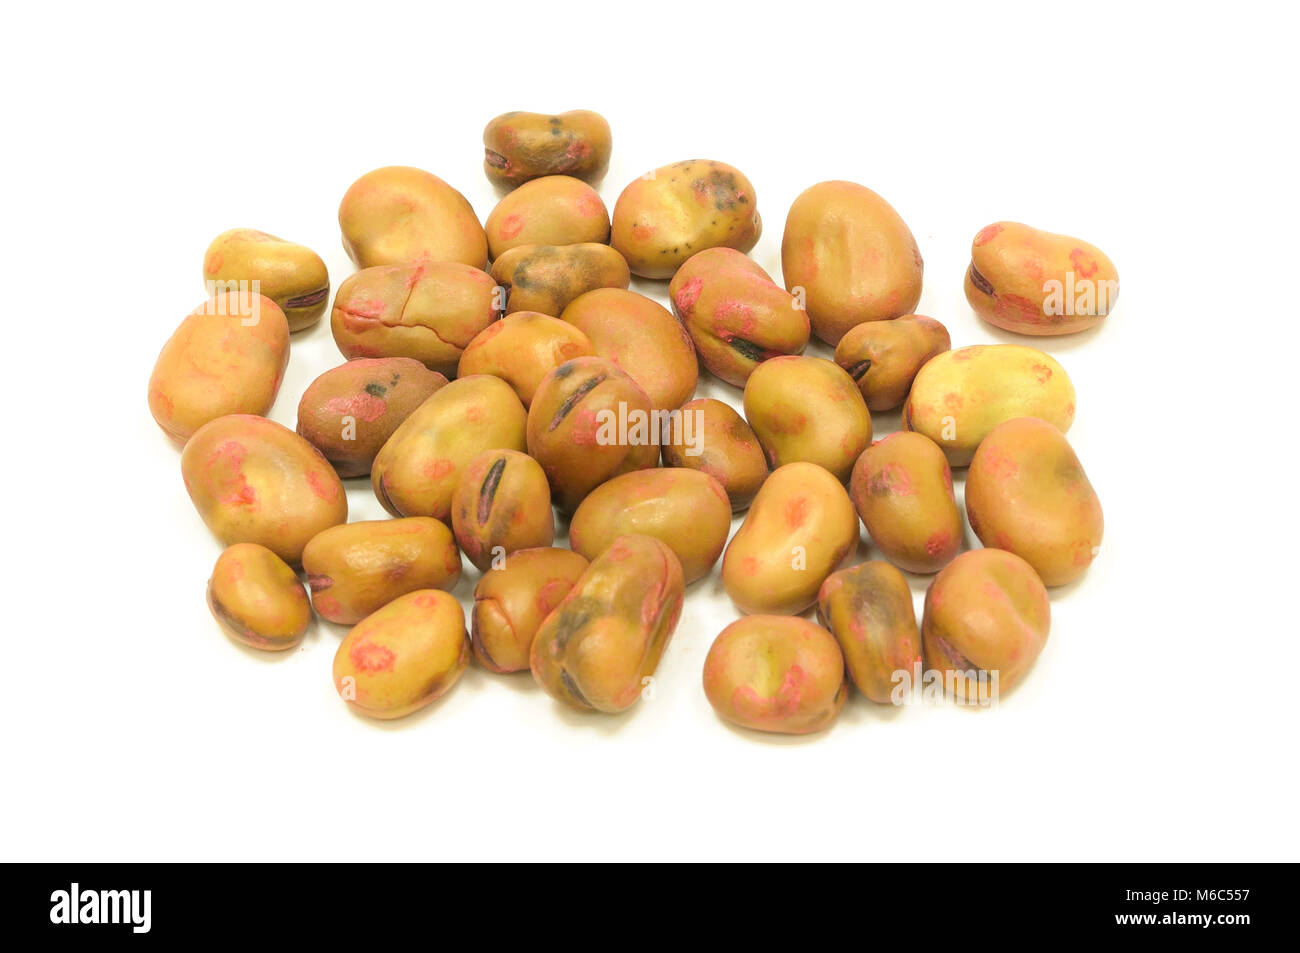 Seed - Stock Image